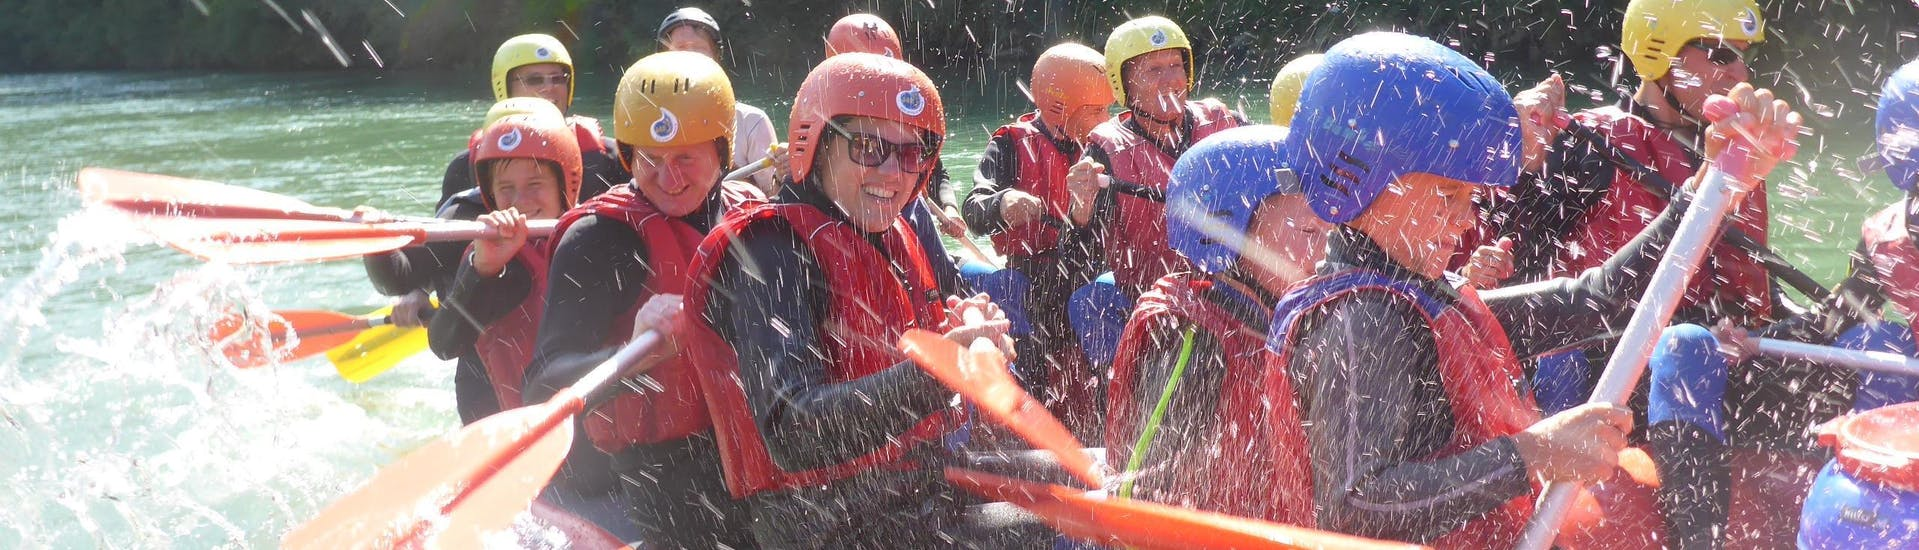 rafting-all-in-one-raft-iller-spirits-of-nature-hero